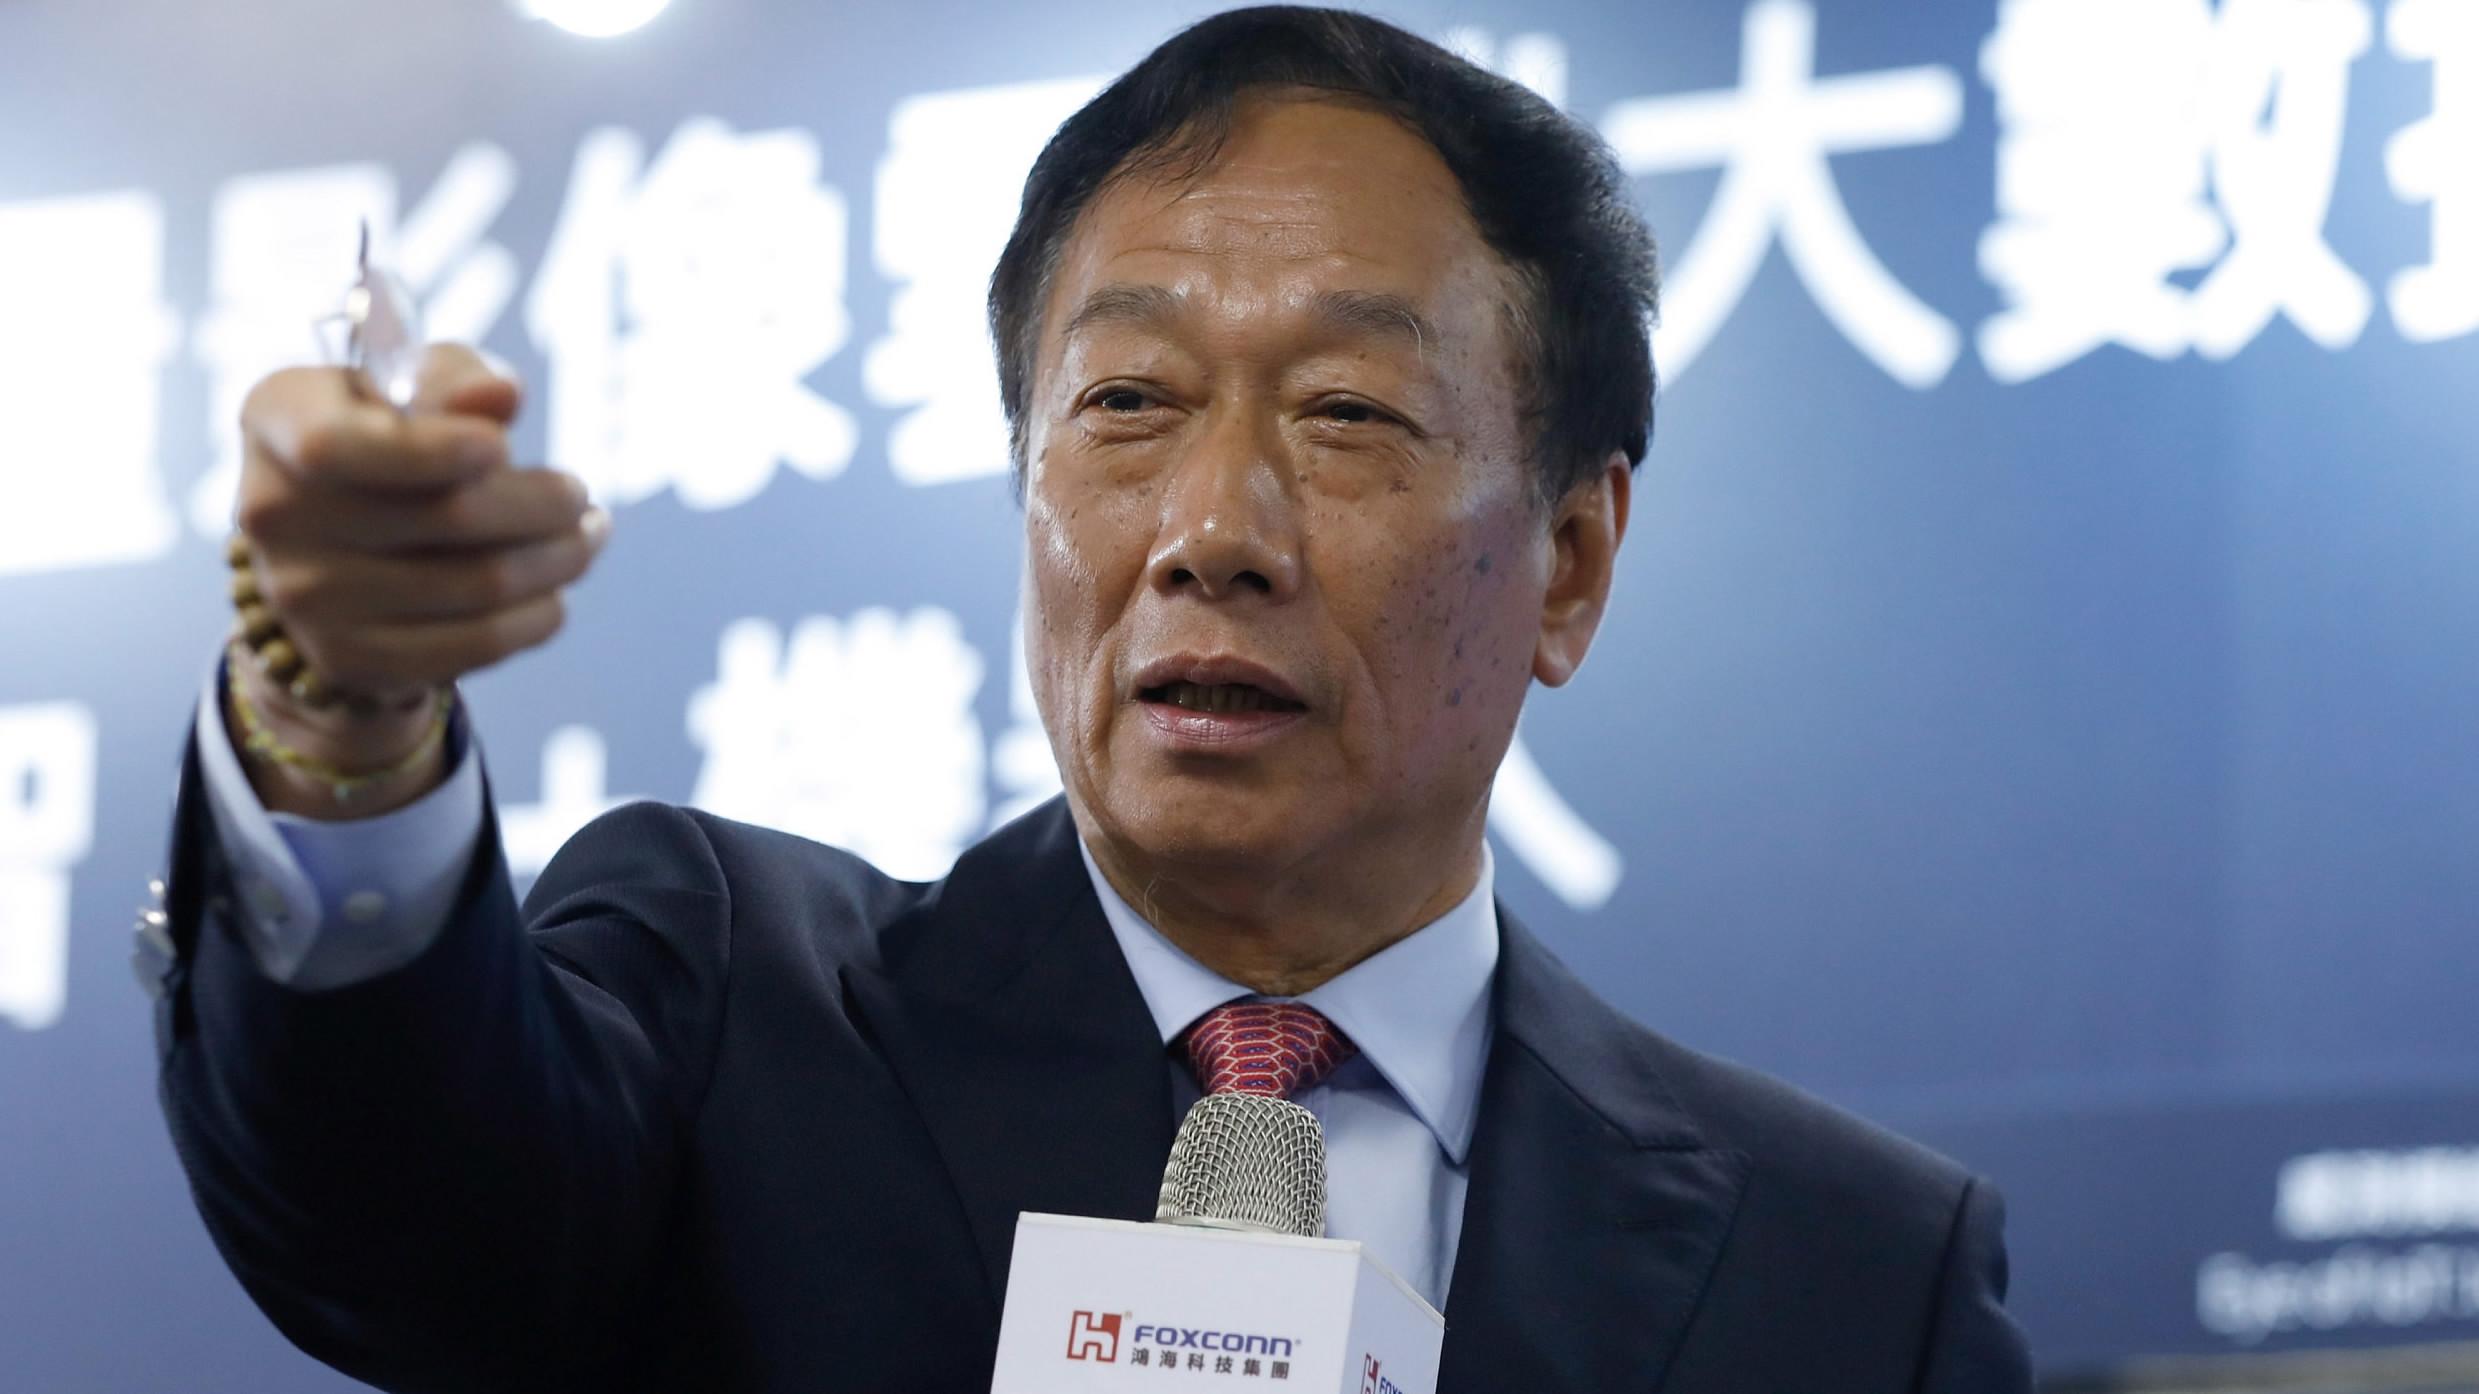 Foxconn chairman: Sea goddess Mazu inspires me to run for Taiwan leader